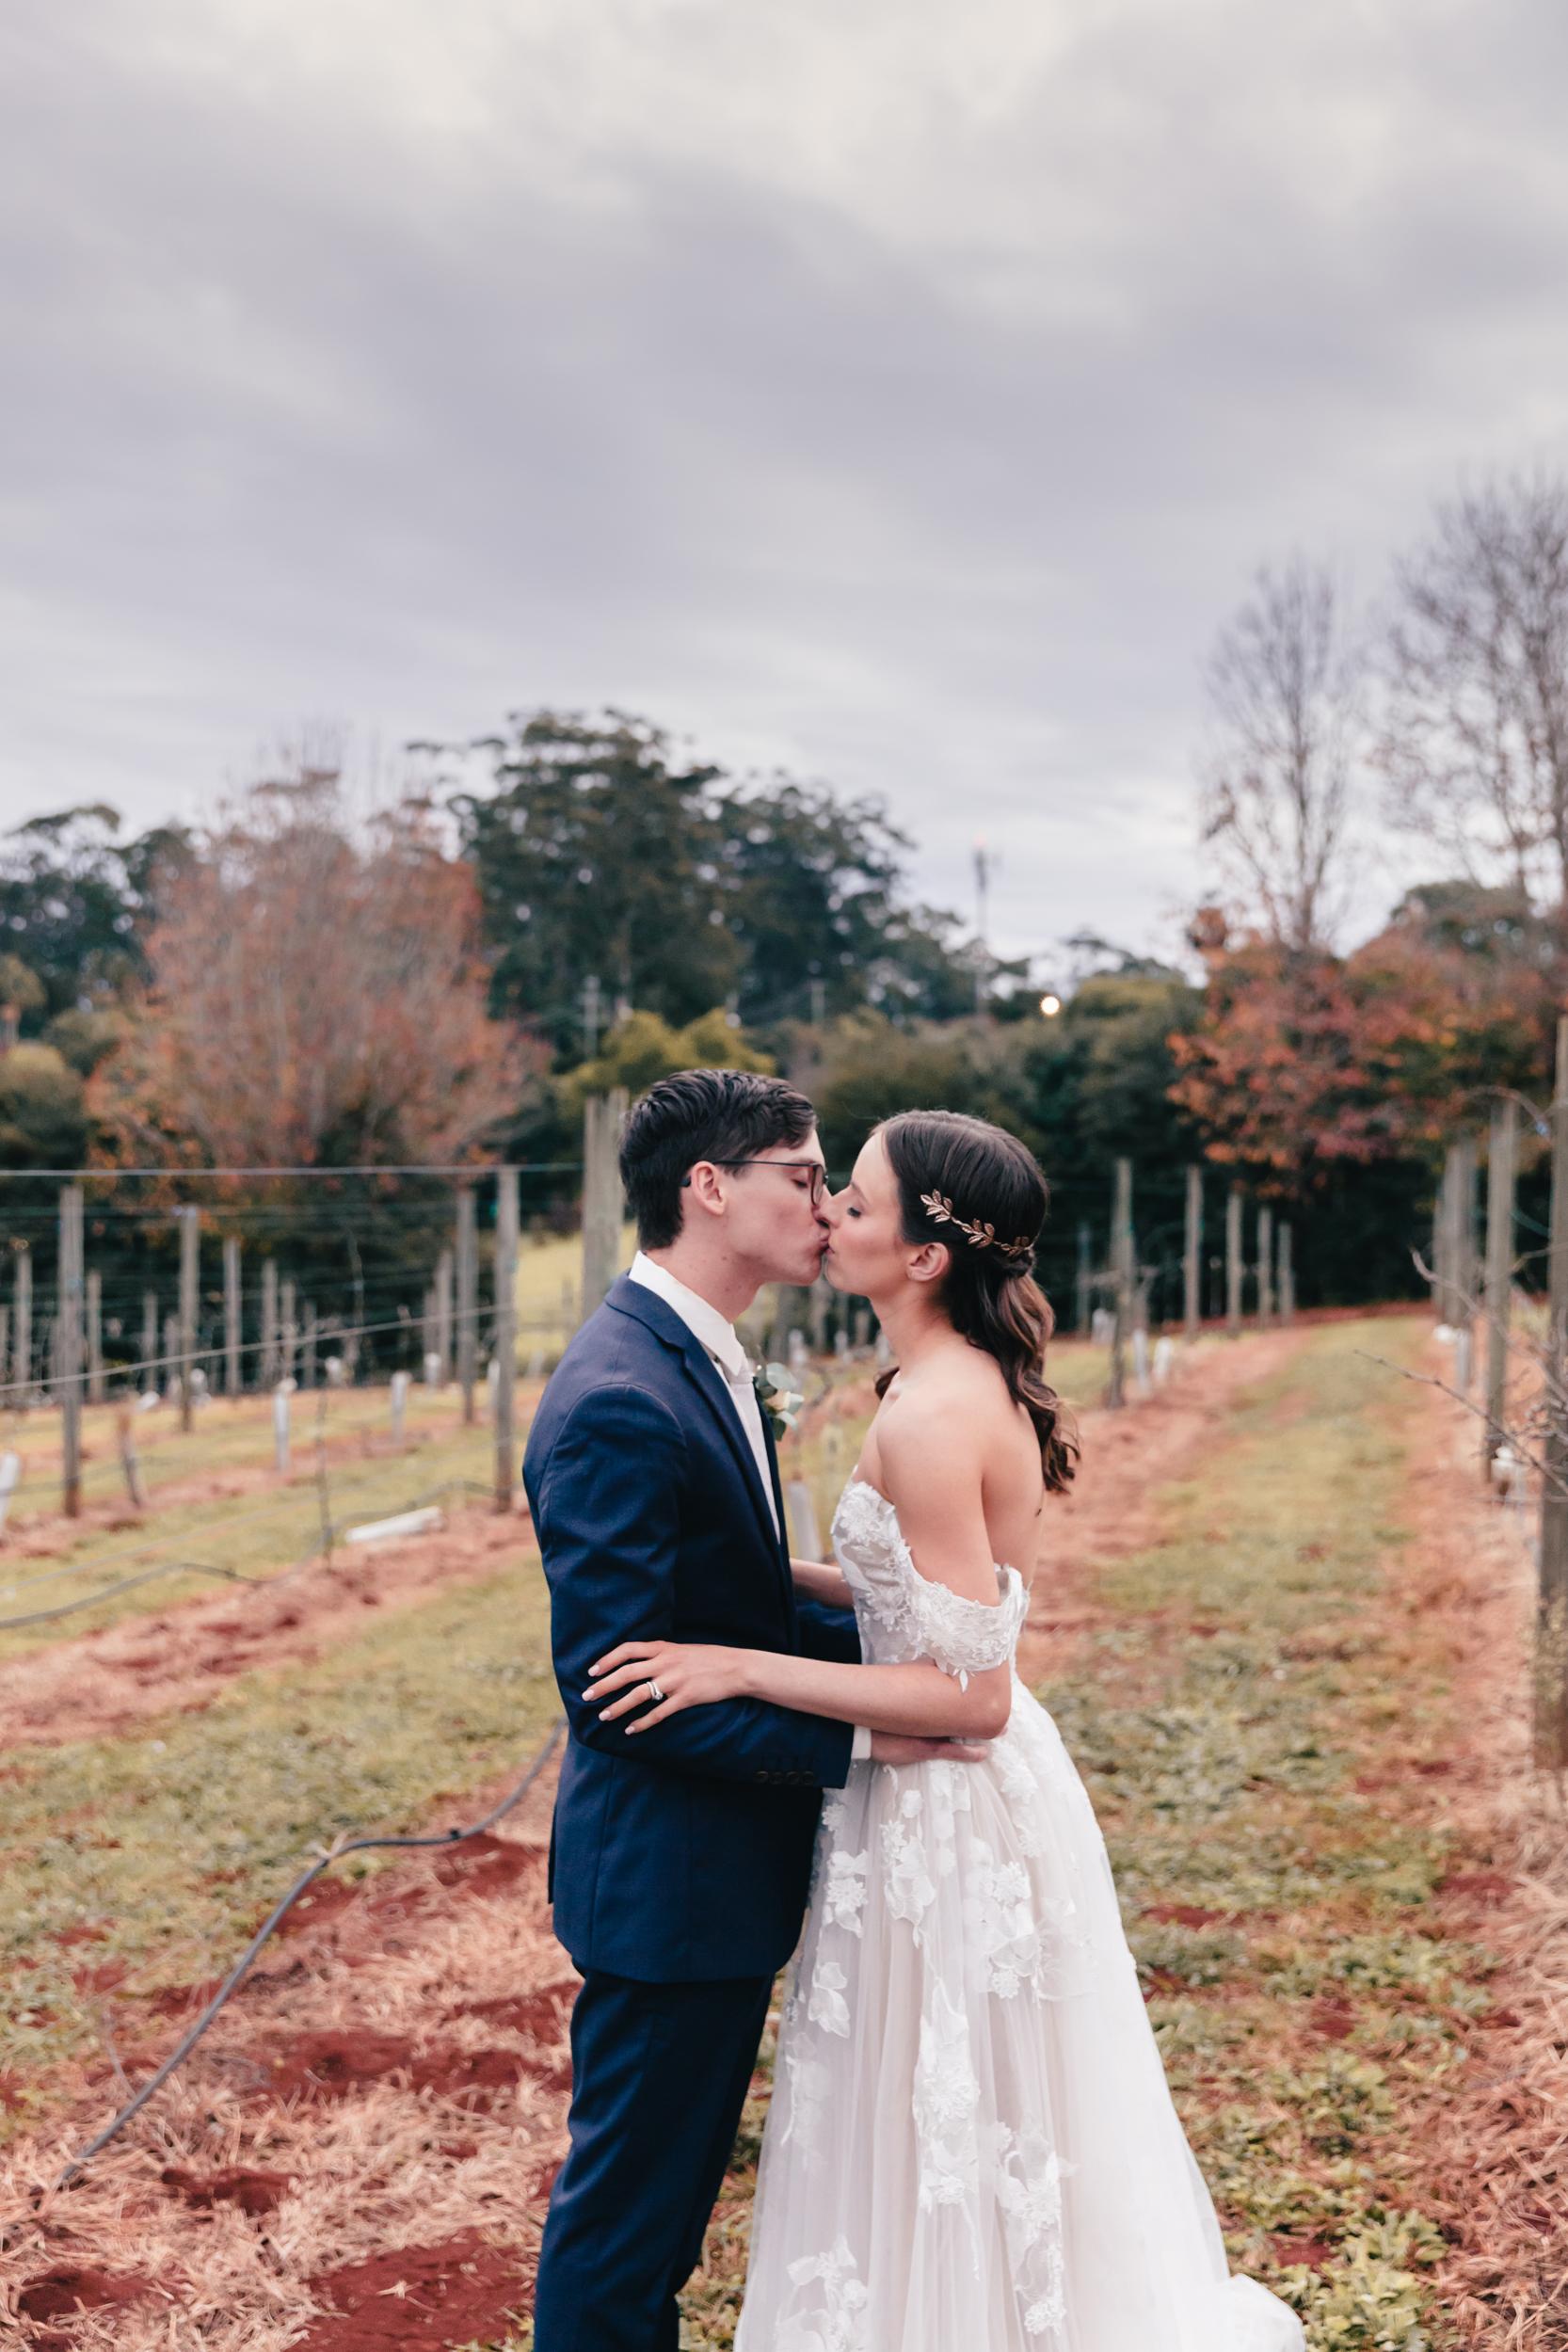 Olivia & Andrew Wedding_Group Photos-124.jpg